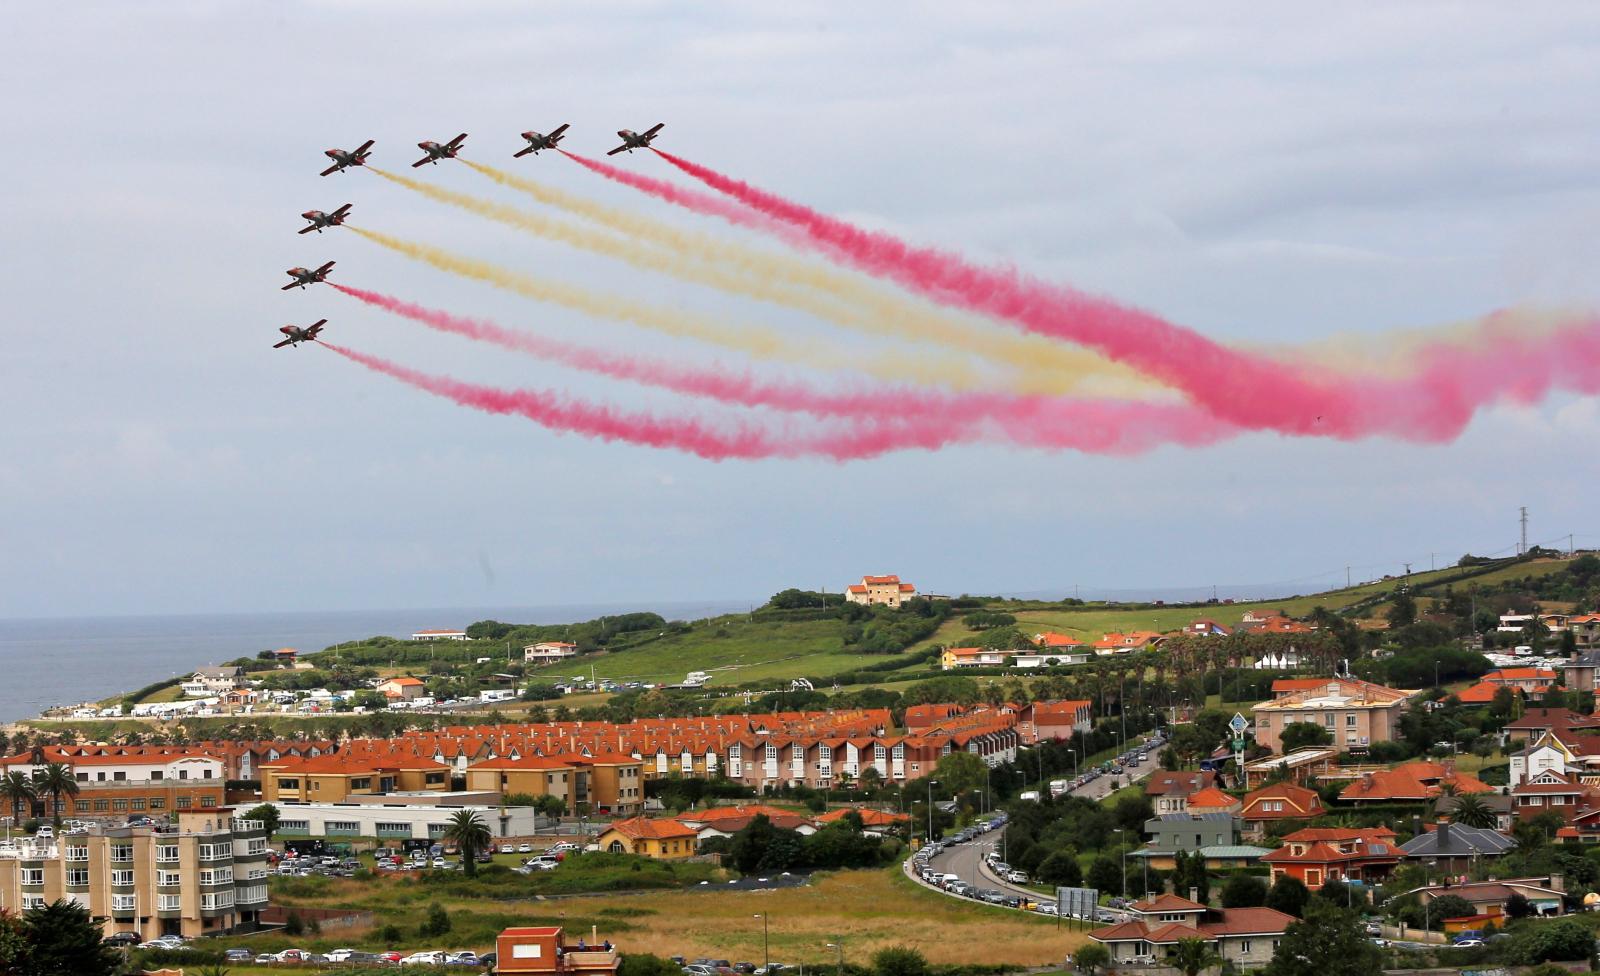 Aerial Festival w Gijon, Hiszpania. Fot. PAP/EPA/ALBERTO MORANTE